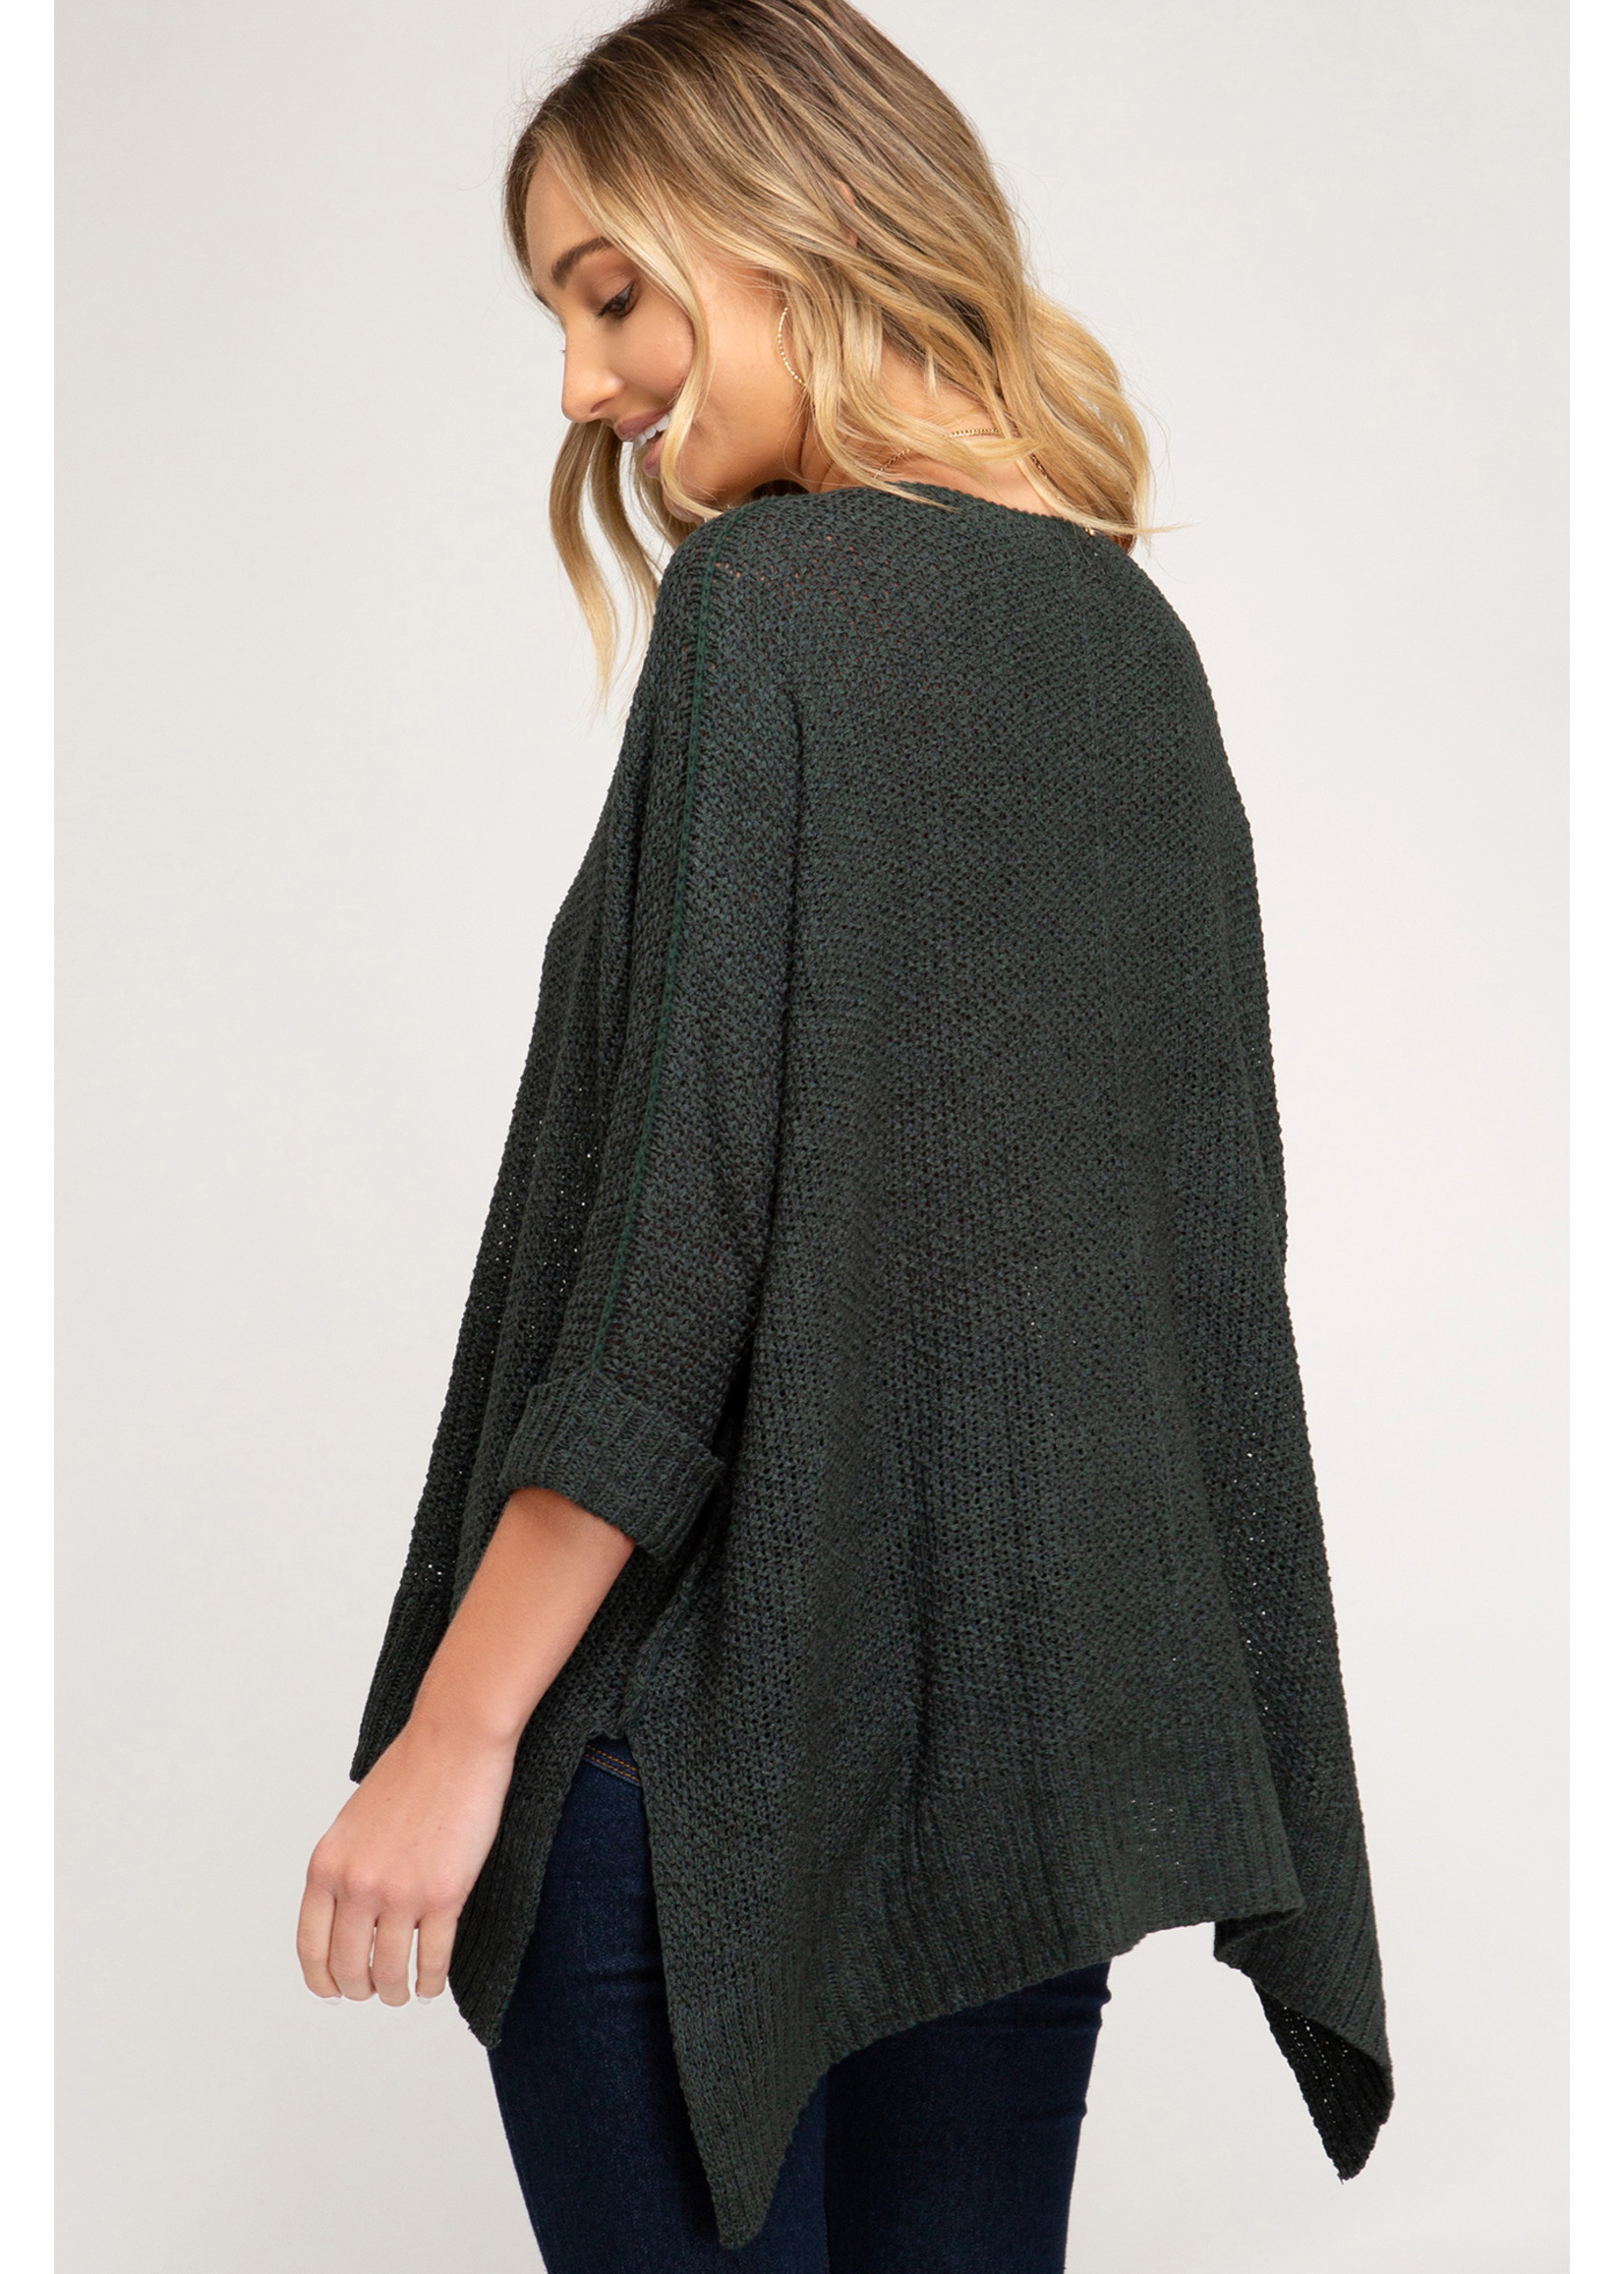 She & Sky Sea Sweater